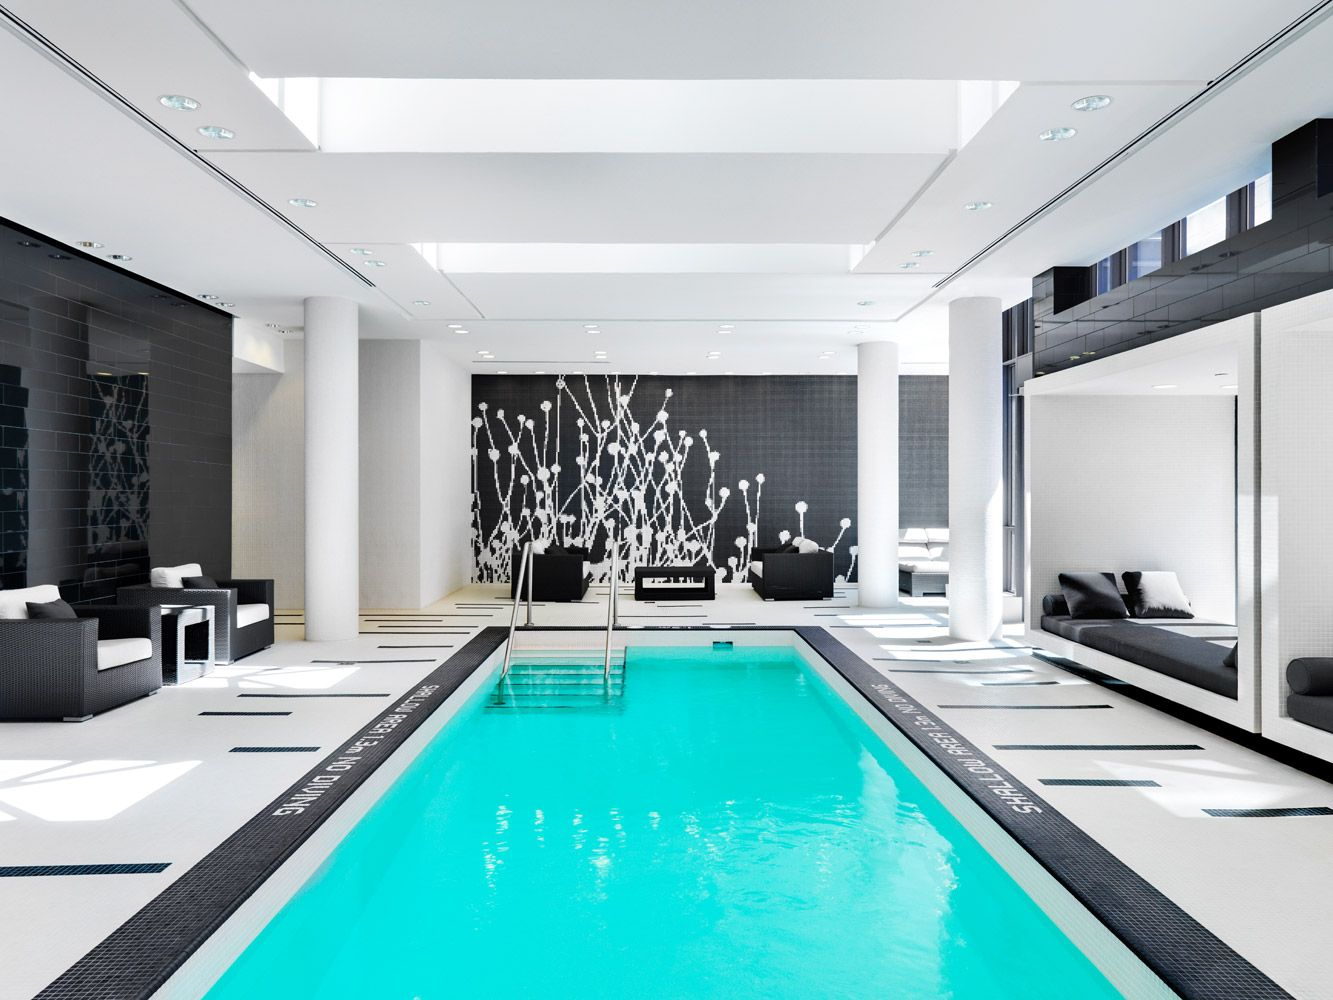 Search For MLS Listings, Resale Condos, New Condos, Pre-construction Condos & Homes For Sale in Toronto >A.Sunny Batra-Toronto Condo Expert of Remax West Realty Inc.